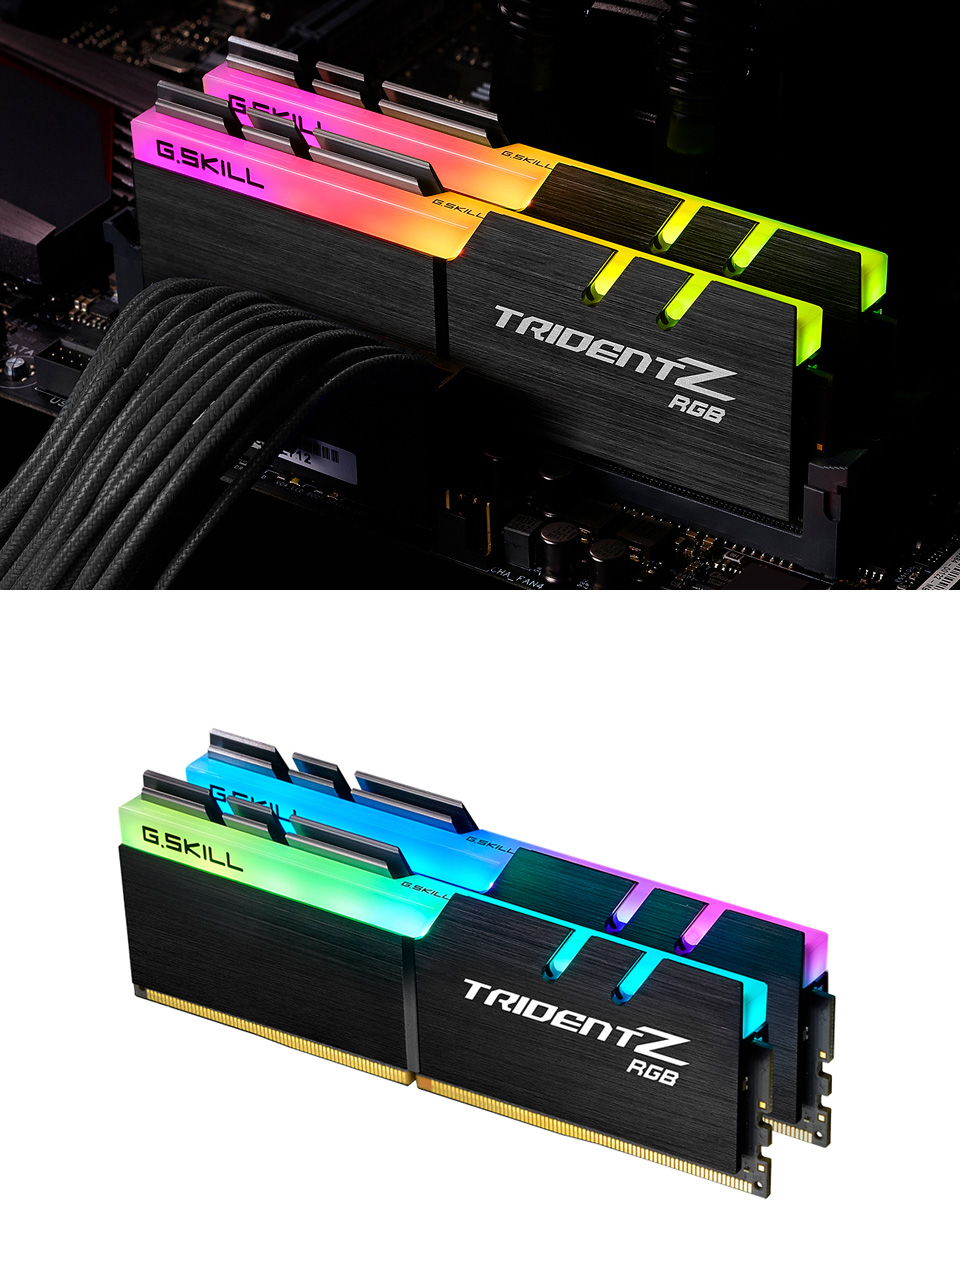 G.Skill Trident Z RGB F4-3600C16D-16GTZRC 16GB (2x8GB) DDR4 product